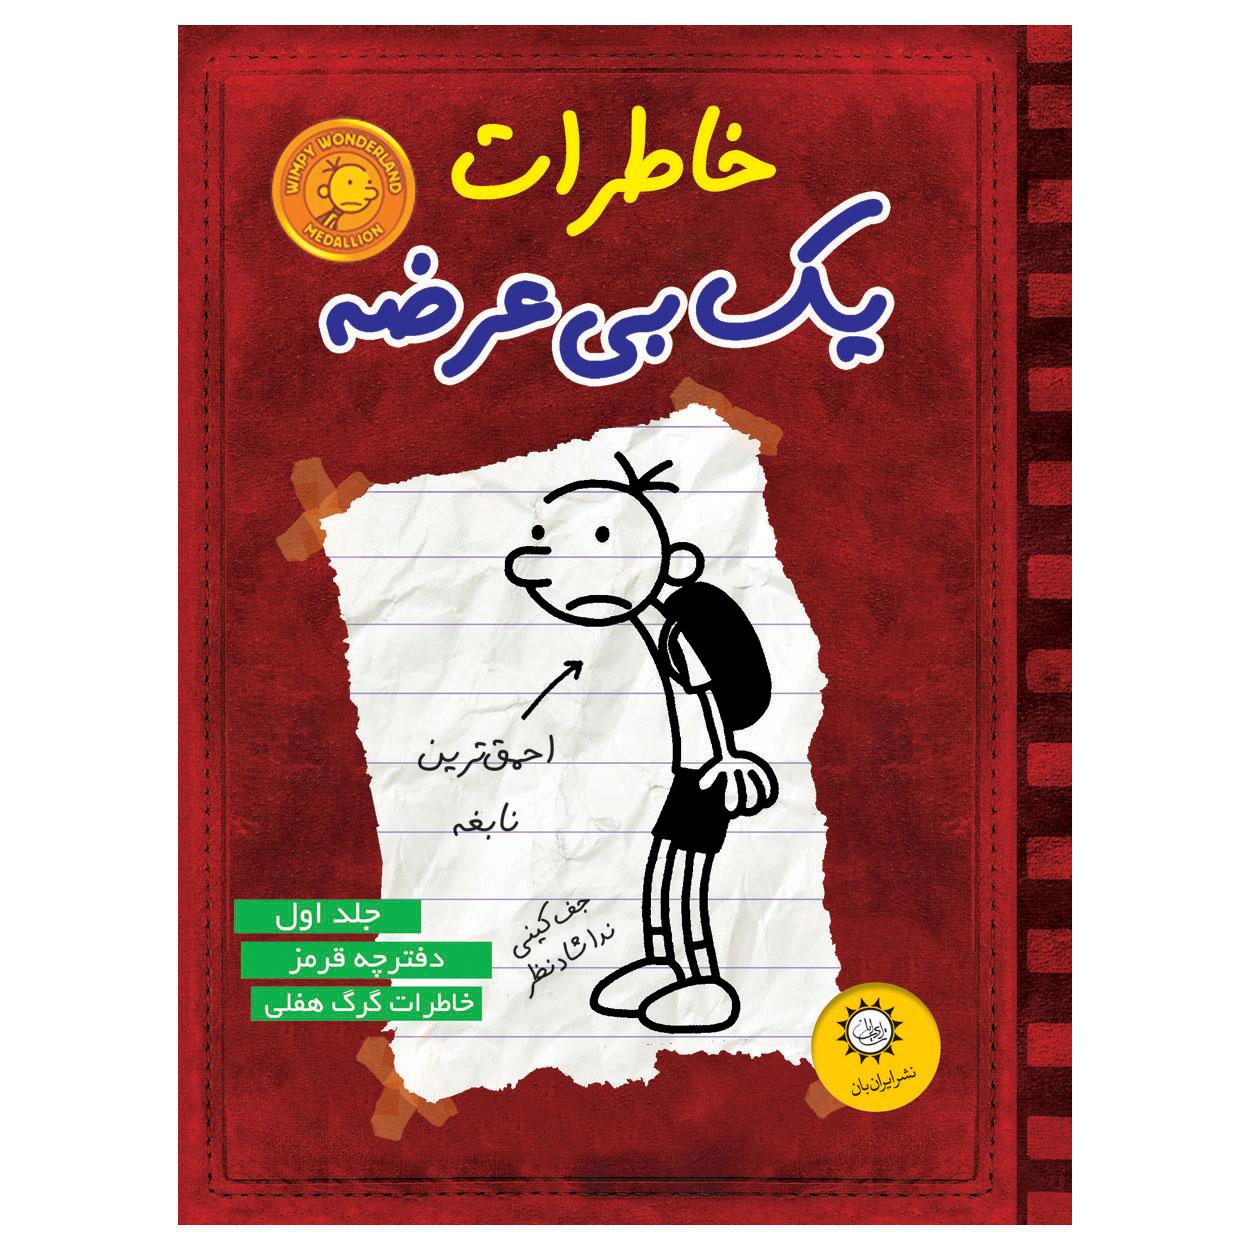 کتاب خاطرات يك بي عرضه اثر جف كيني نشر ايران بان جلد 1